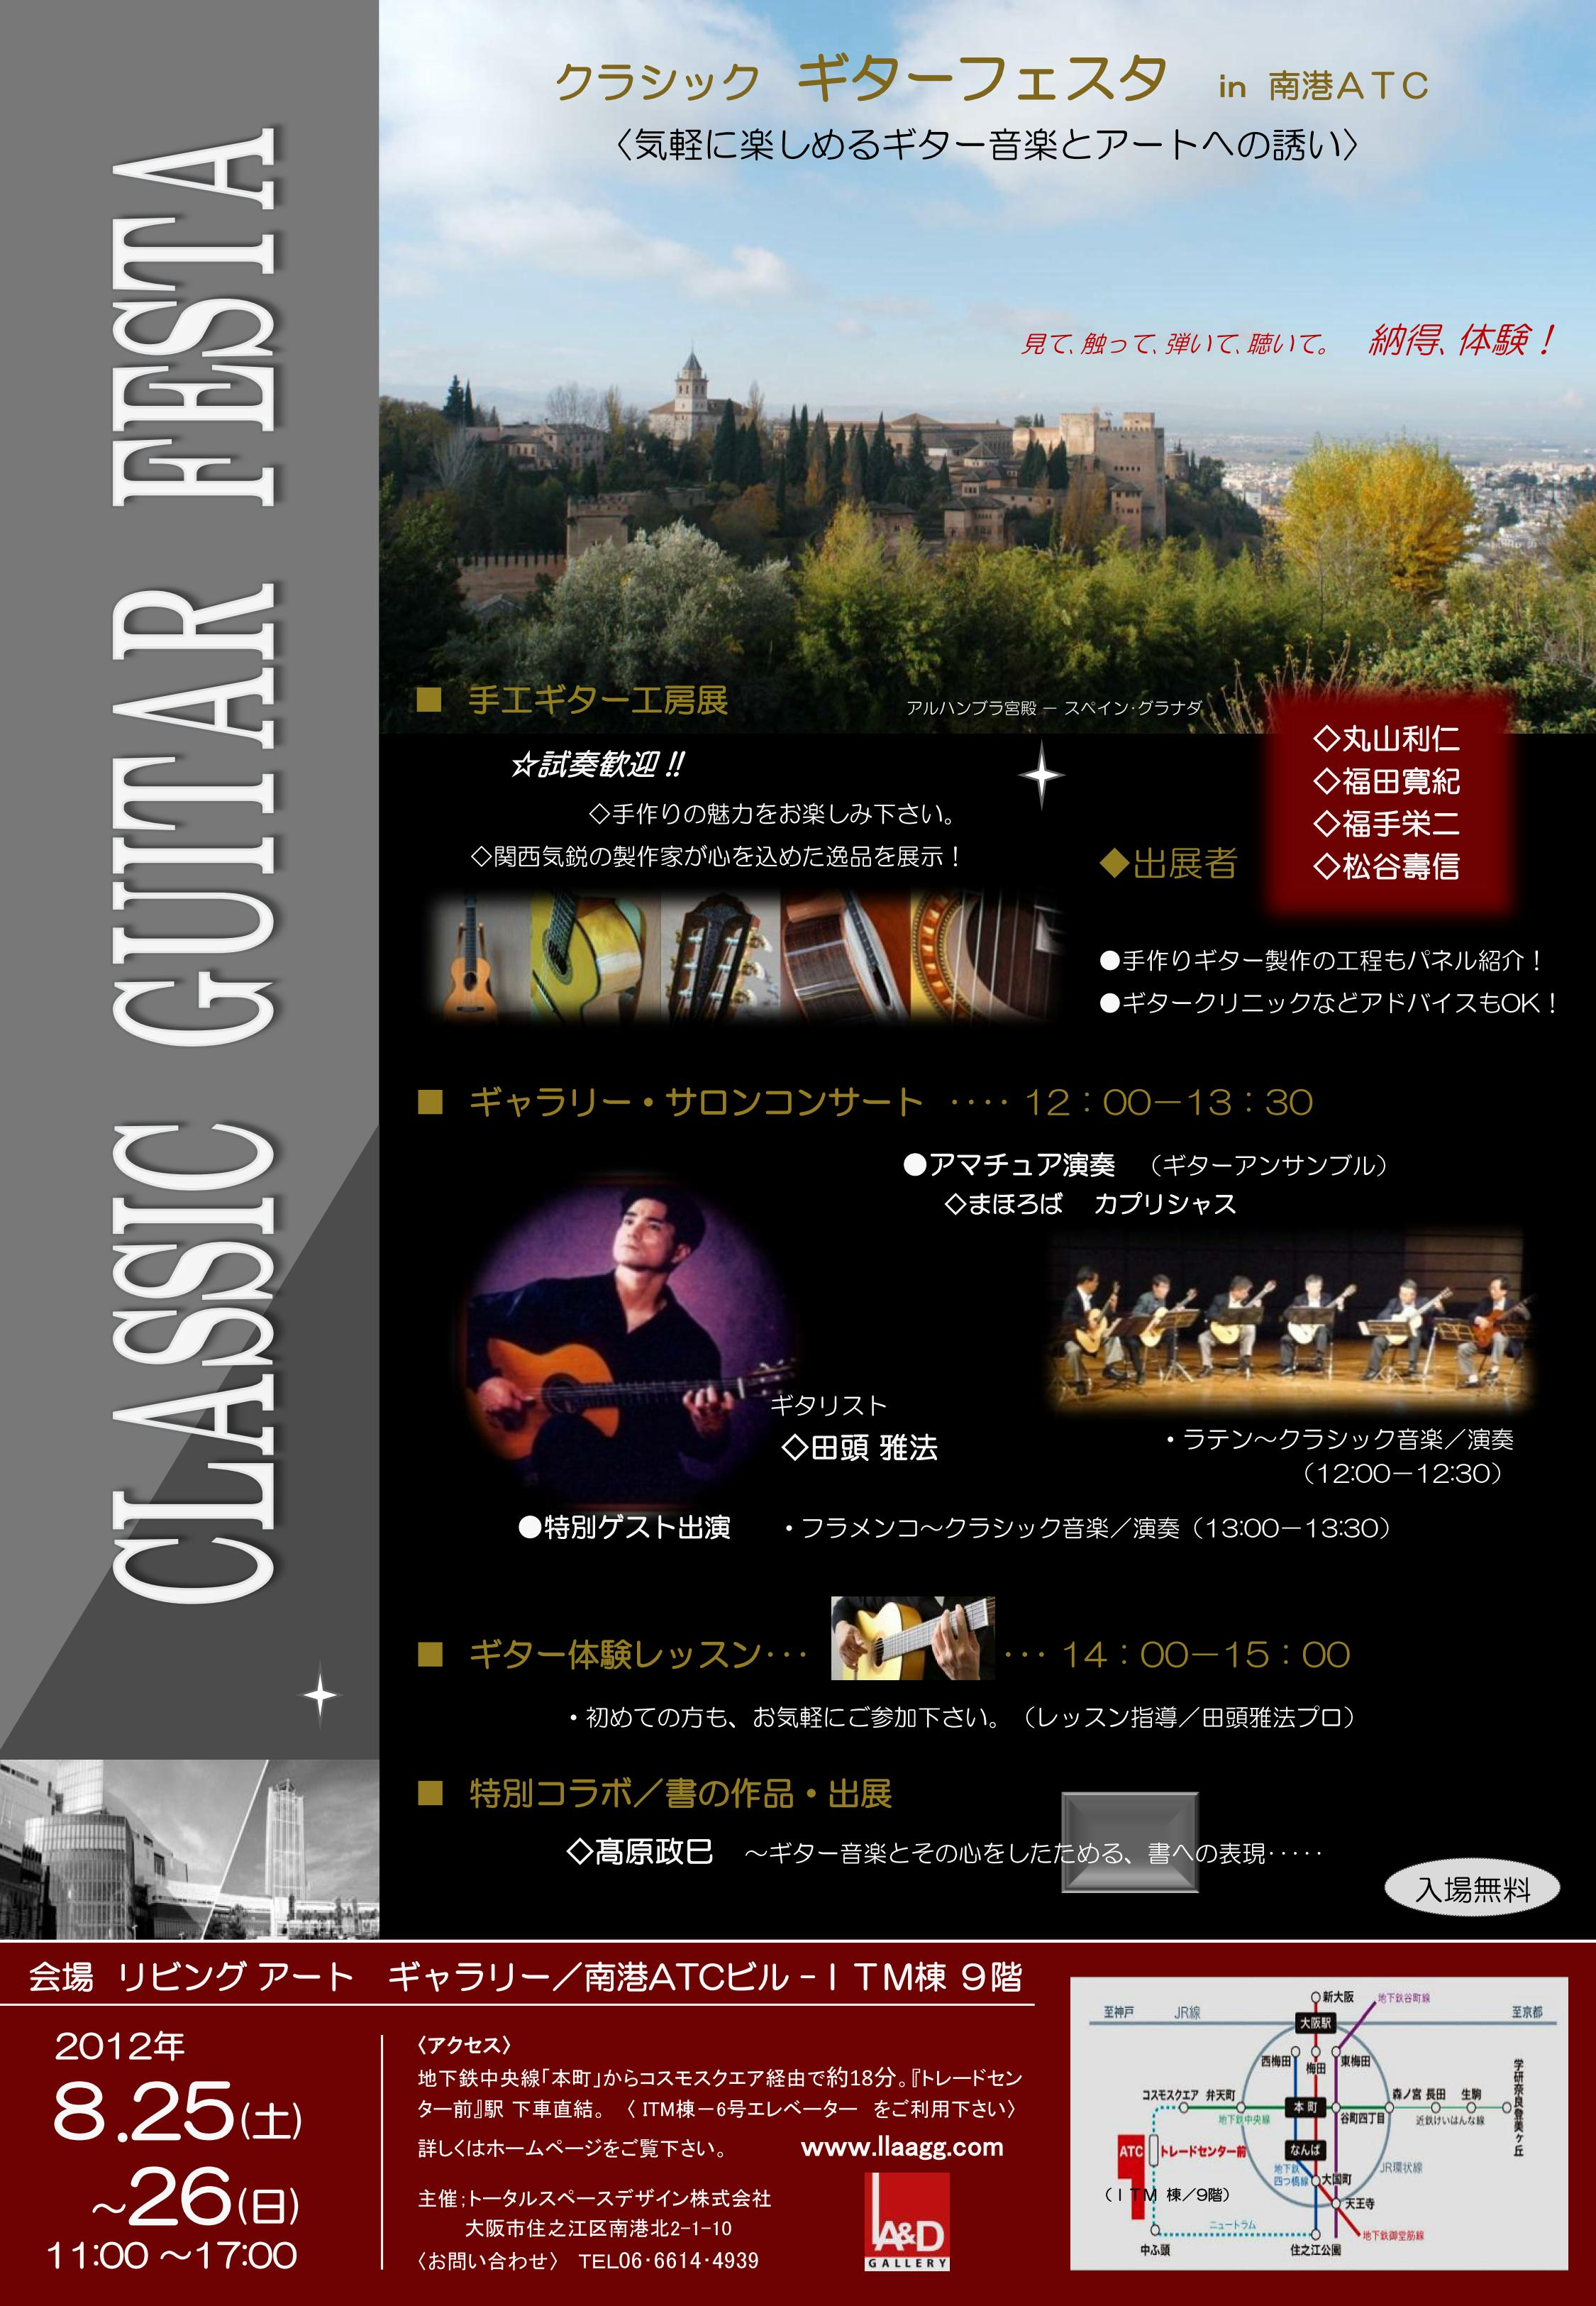 GuitarFesta_ATC0.jpg